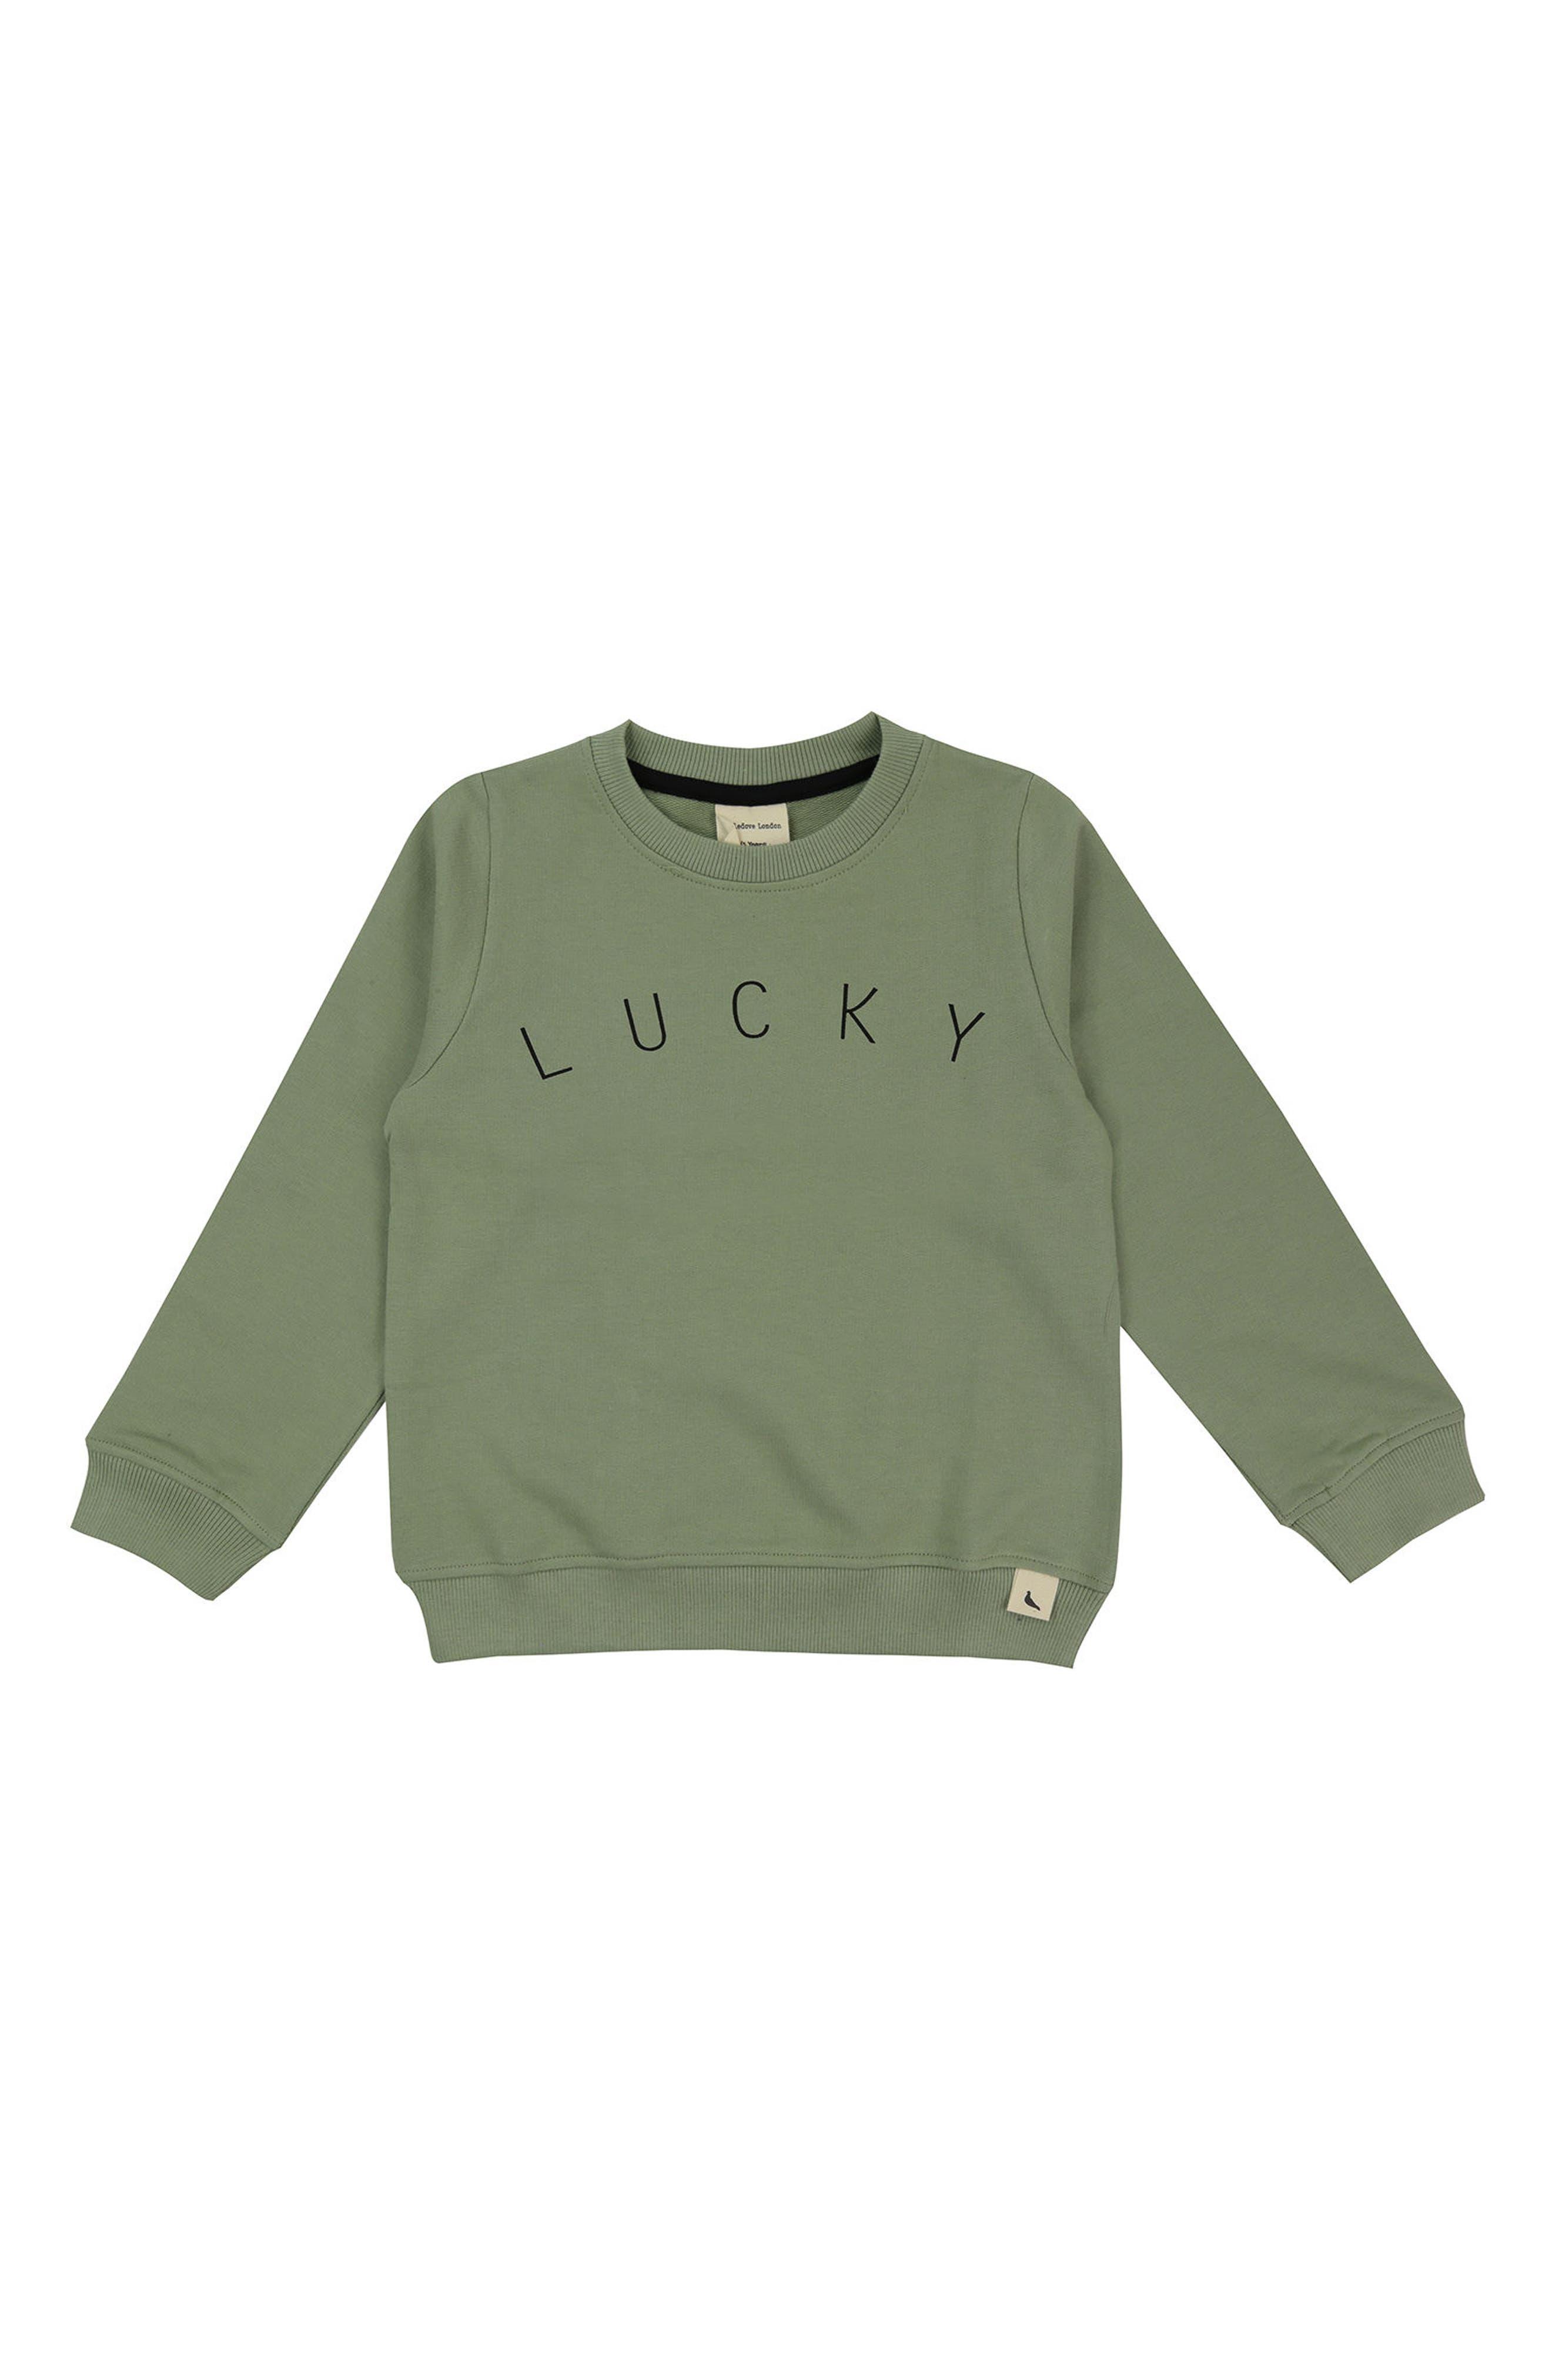 Lucky Sweatshirt,                             Main thumbnail 1, color,                             Sage